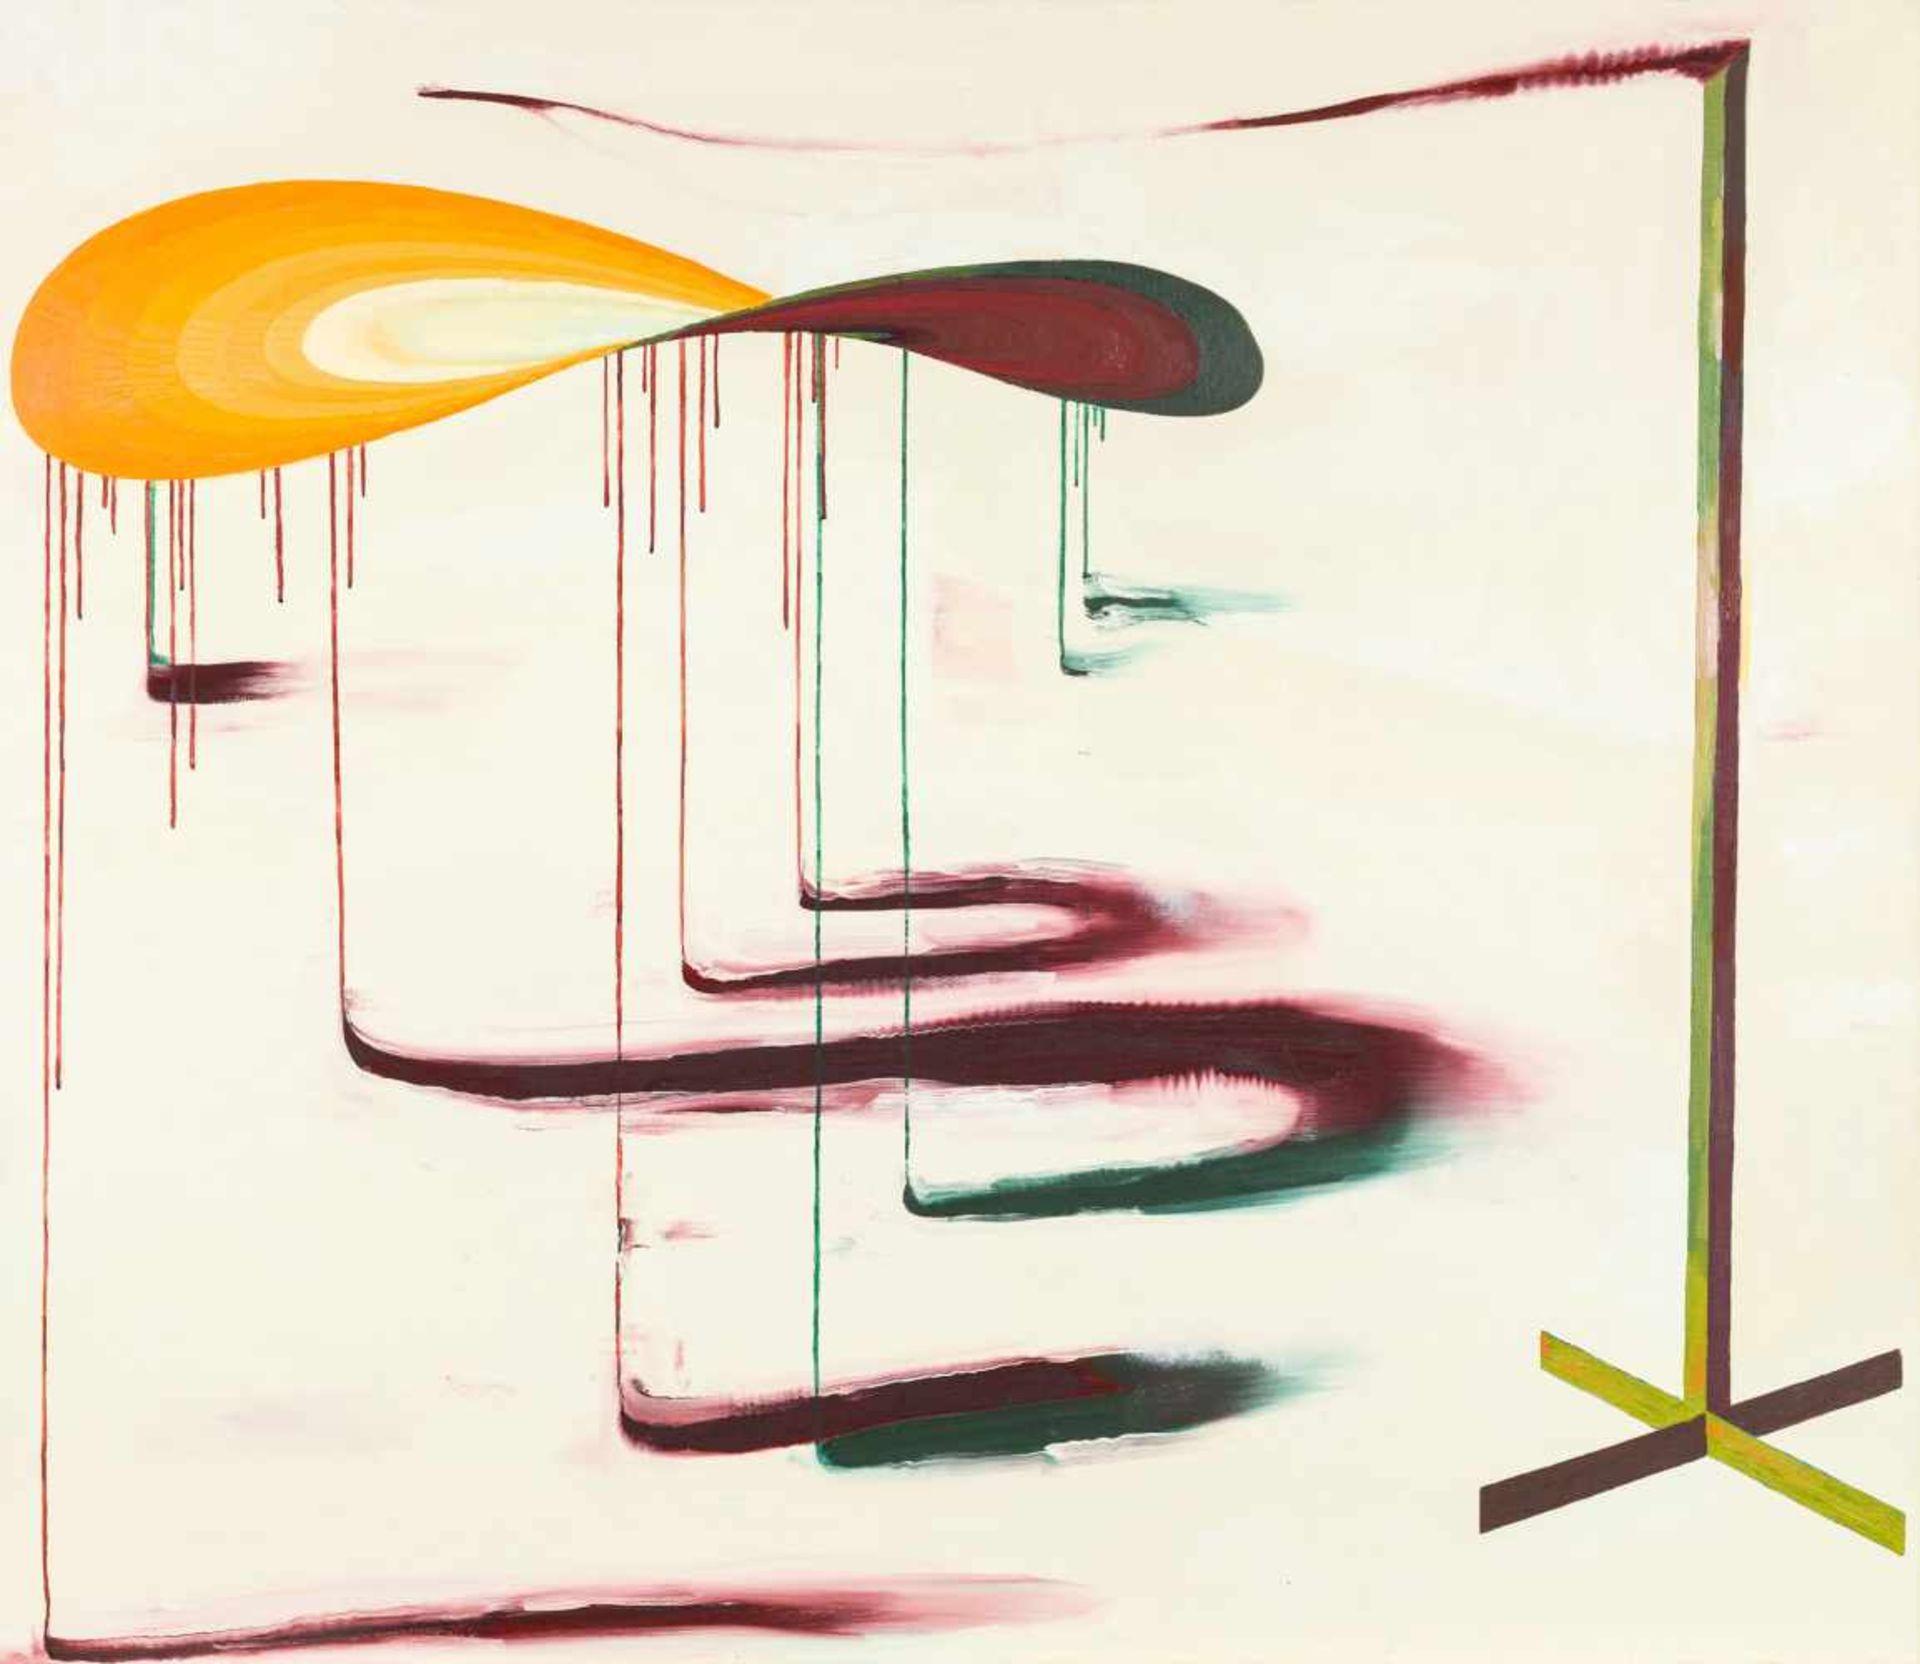 Los 17 - Pawel Ksiazek * Kraków (Polen) 1973 geb. VIBRATING OBJECT Öl auf Leinwand 130 x 150 cm 2004